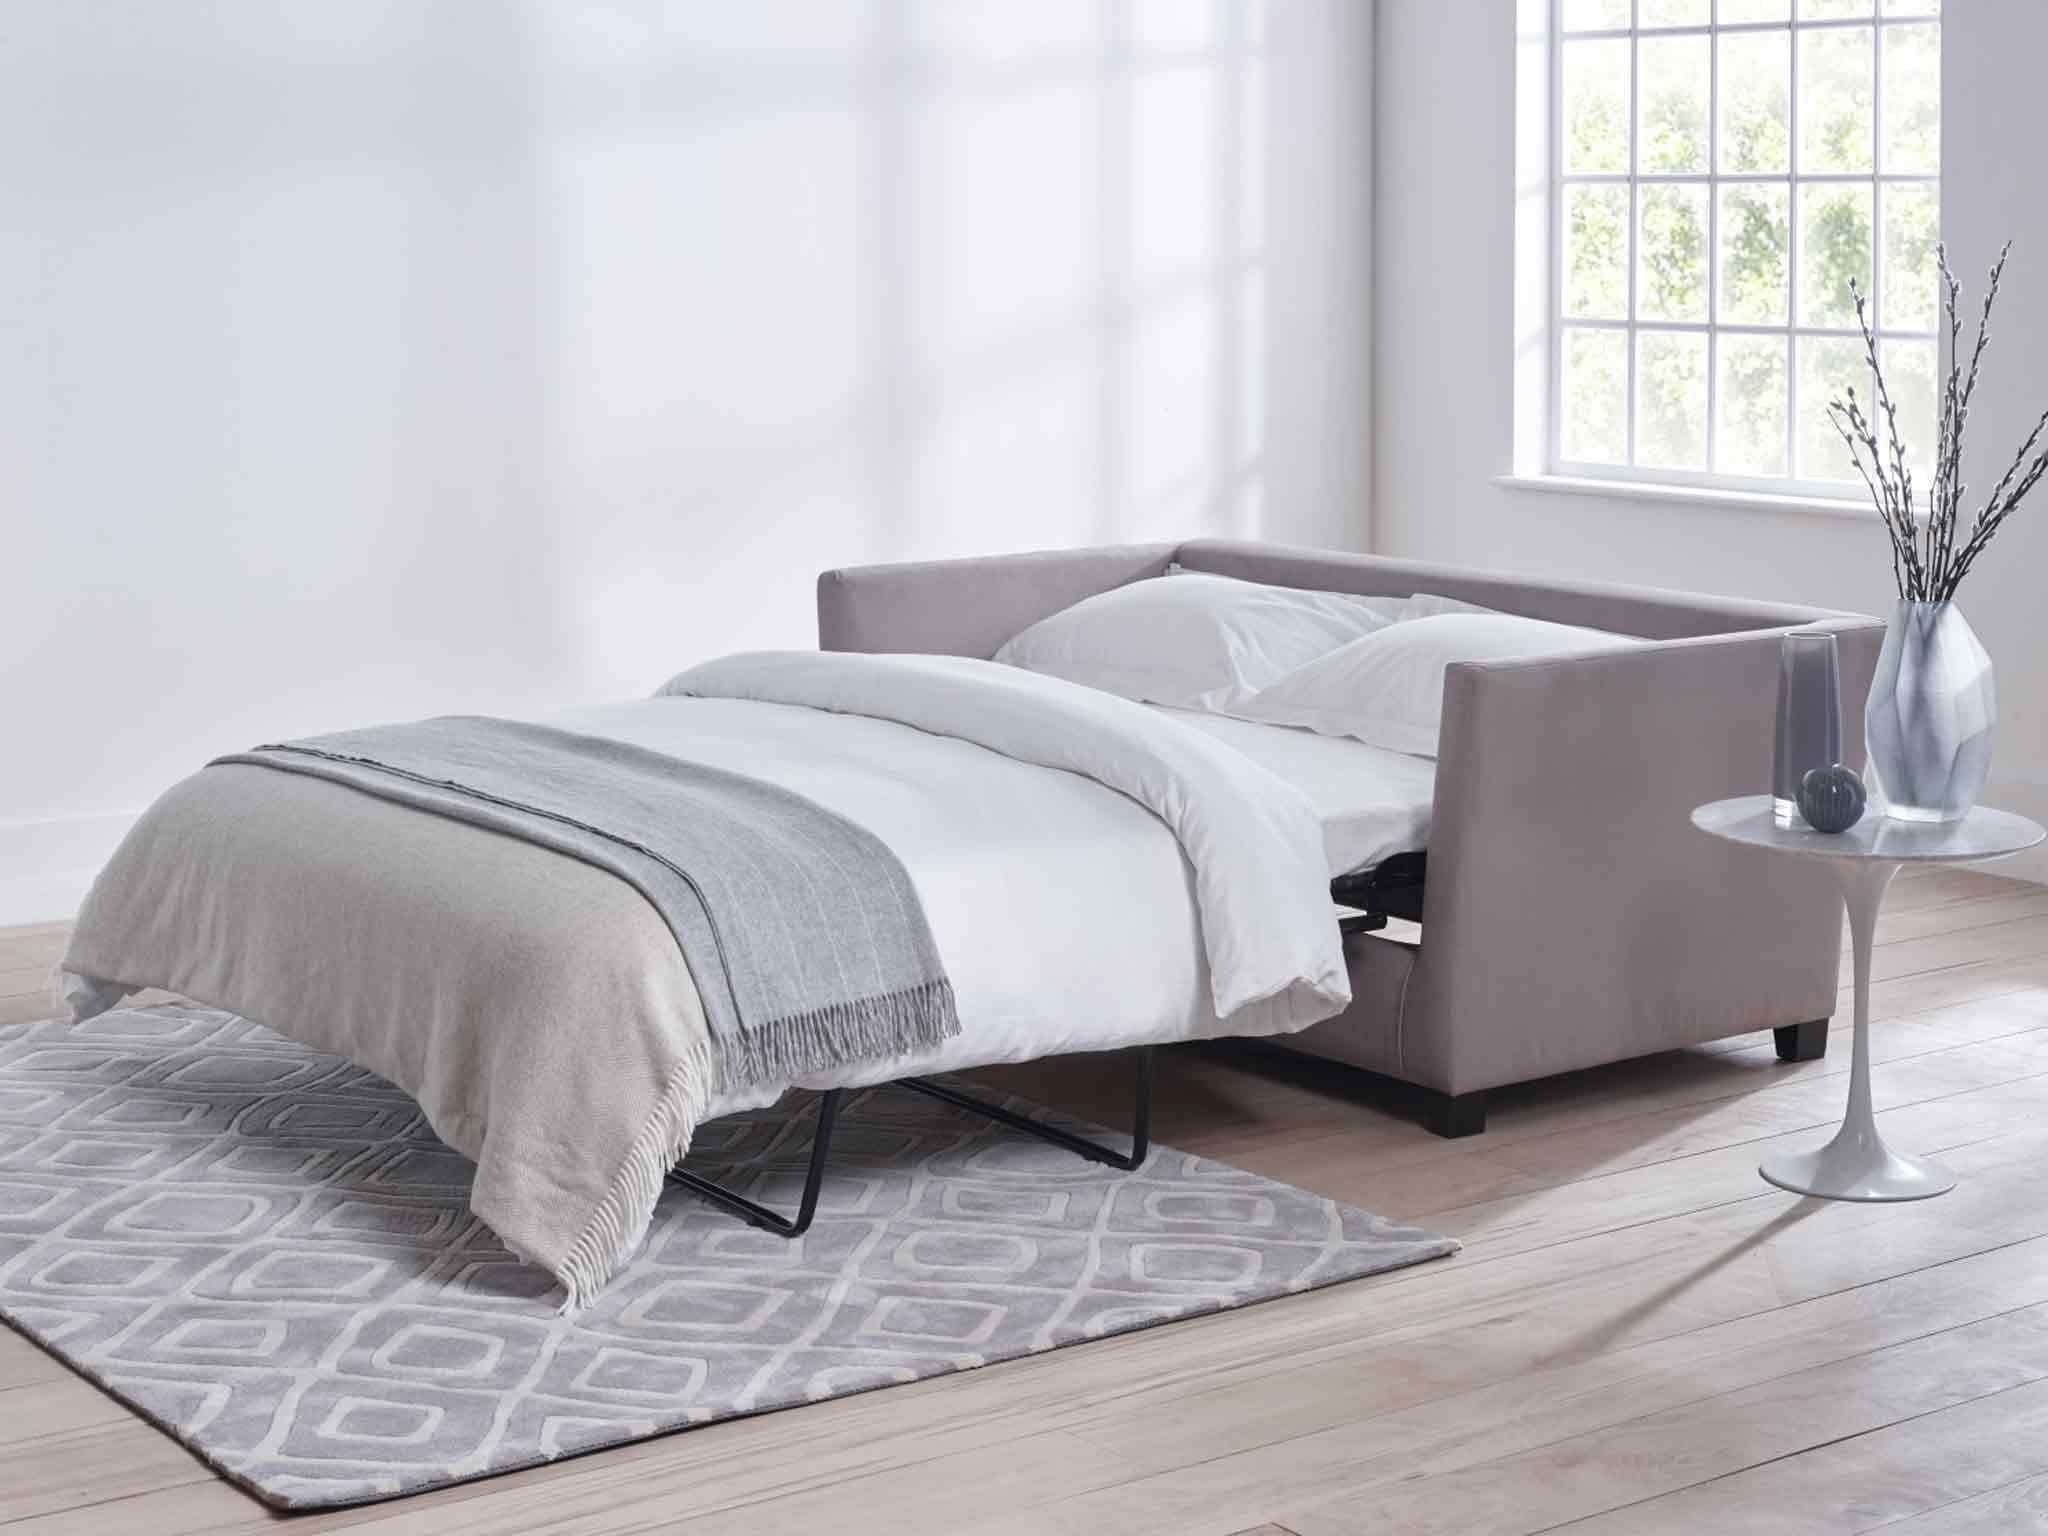 sheets for sofa bed recliner malaysia murah mattress sleeper